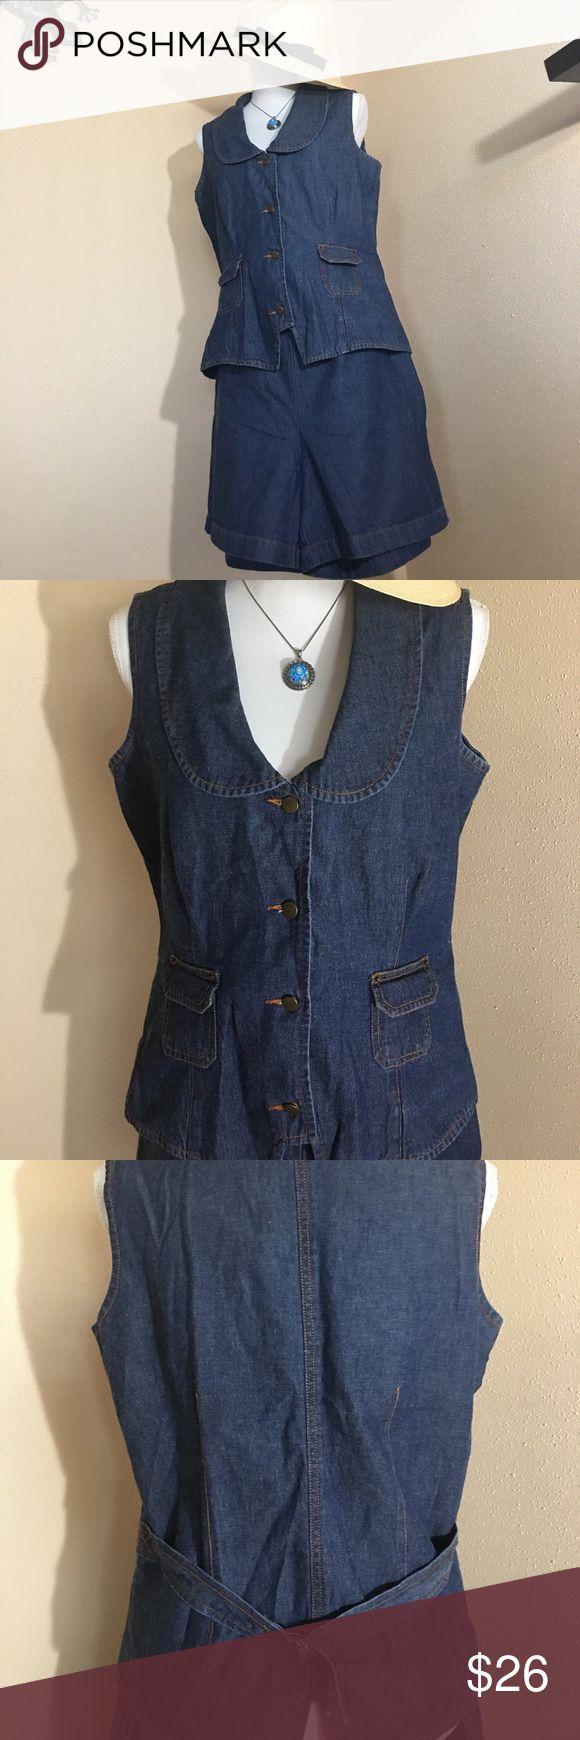 FORENZA-Blue Jean VEST/SHORTS 12 $26 Really Stylish Cute Blue Jean short set FORENZA Shorts Jean Shorts